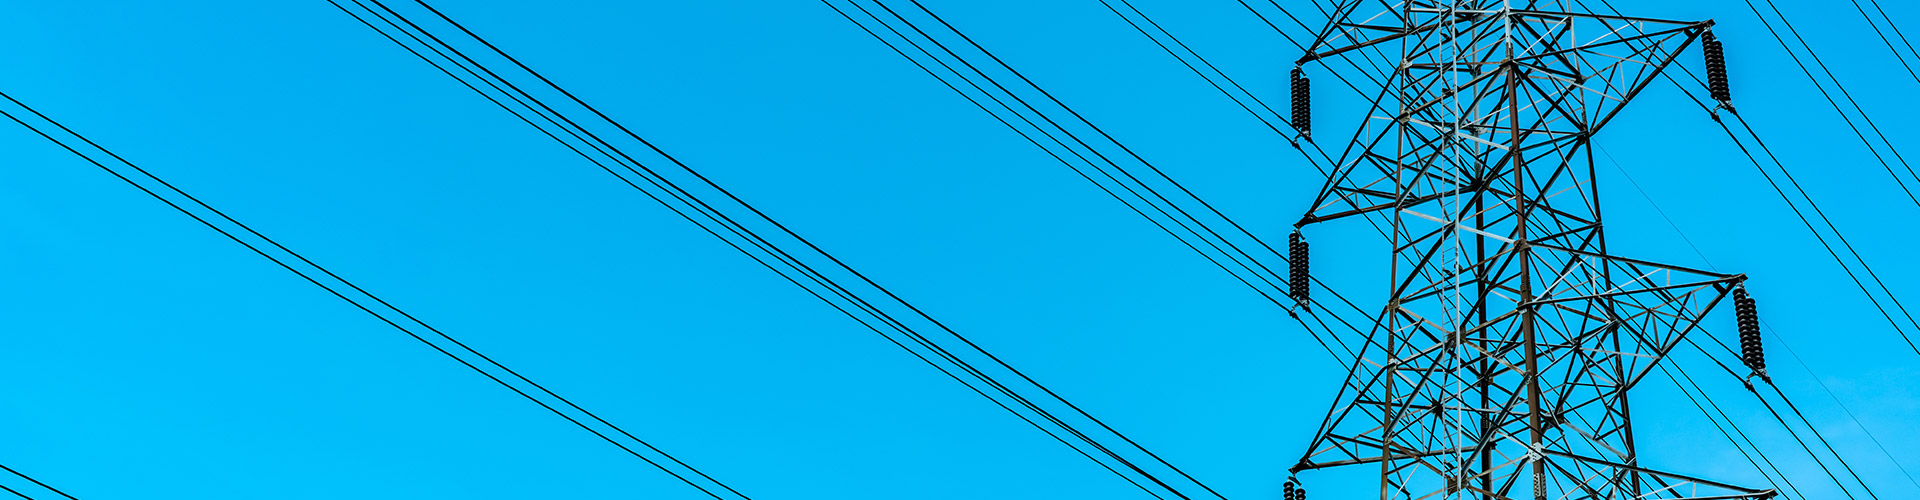 Utilities-L2-idms-Banner-1